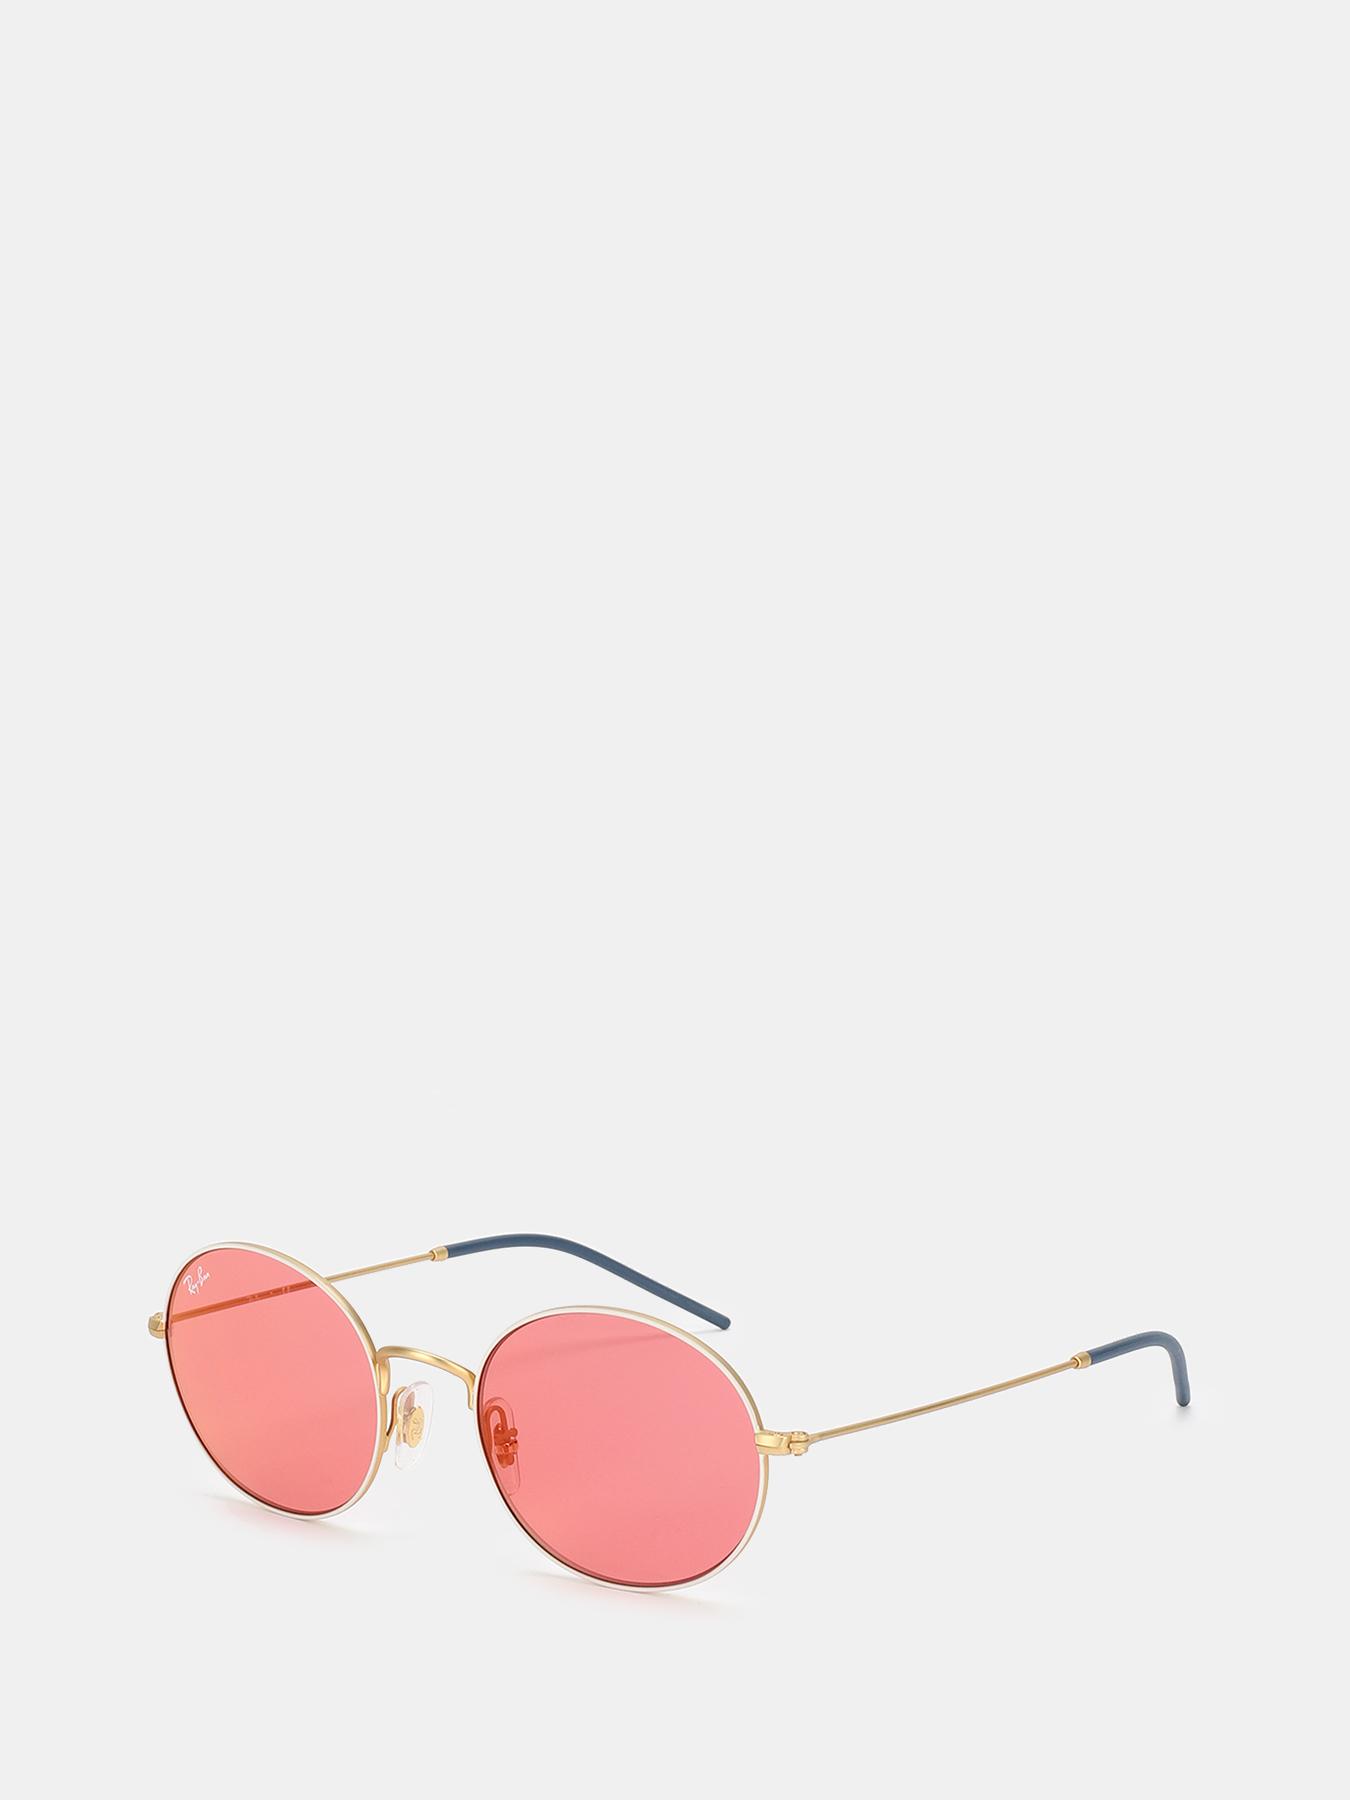 Очки Ray-Ban Солнцезащитные очки солнцезащитные очки kameo bis солнцезащитные очки